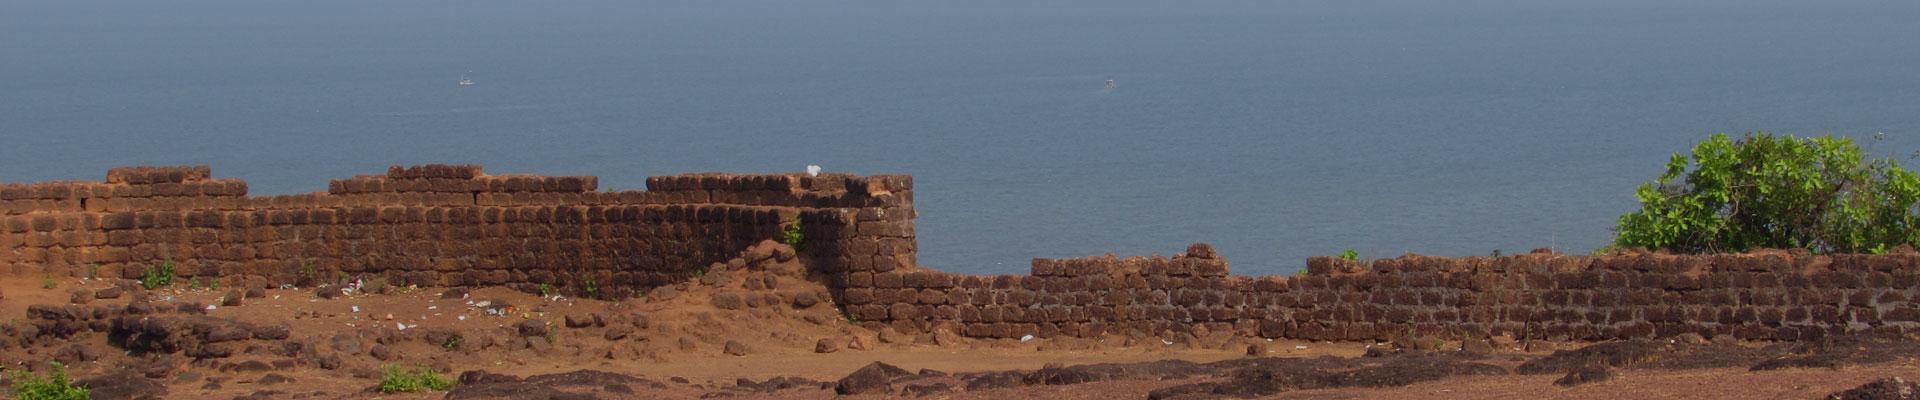 Vagator fort